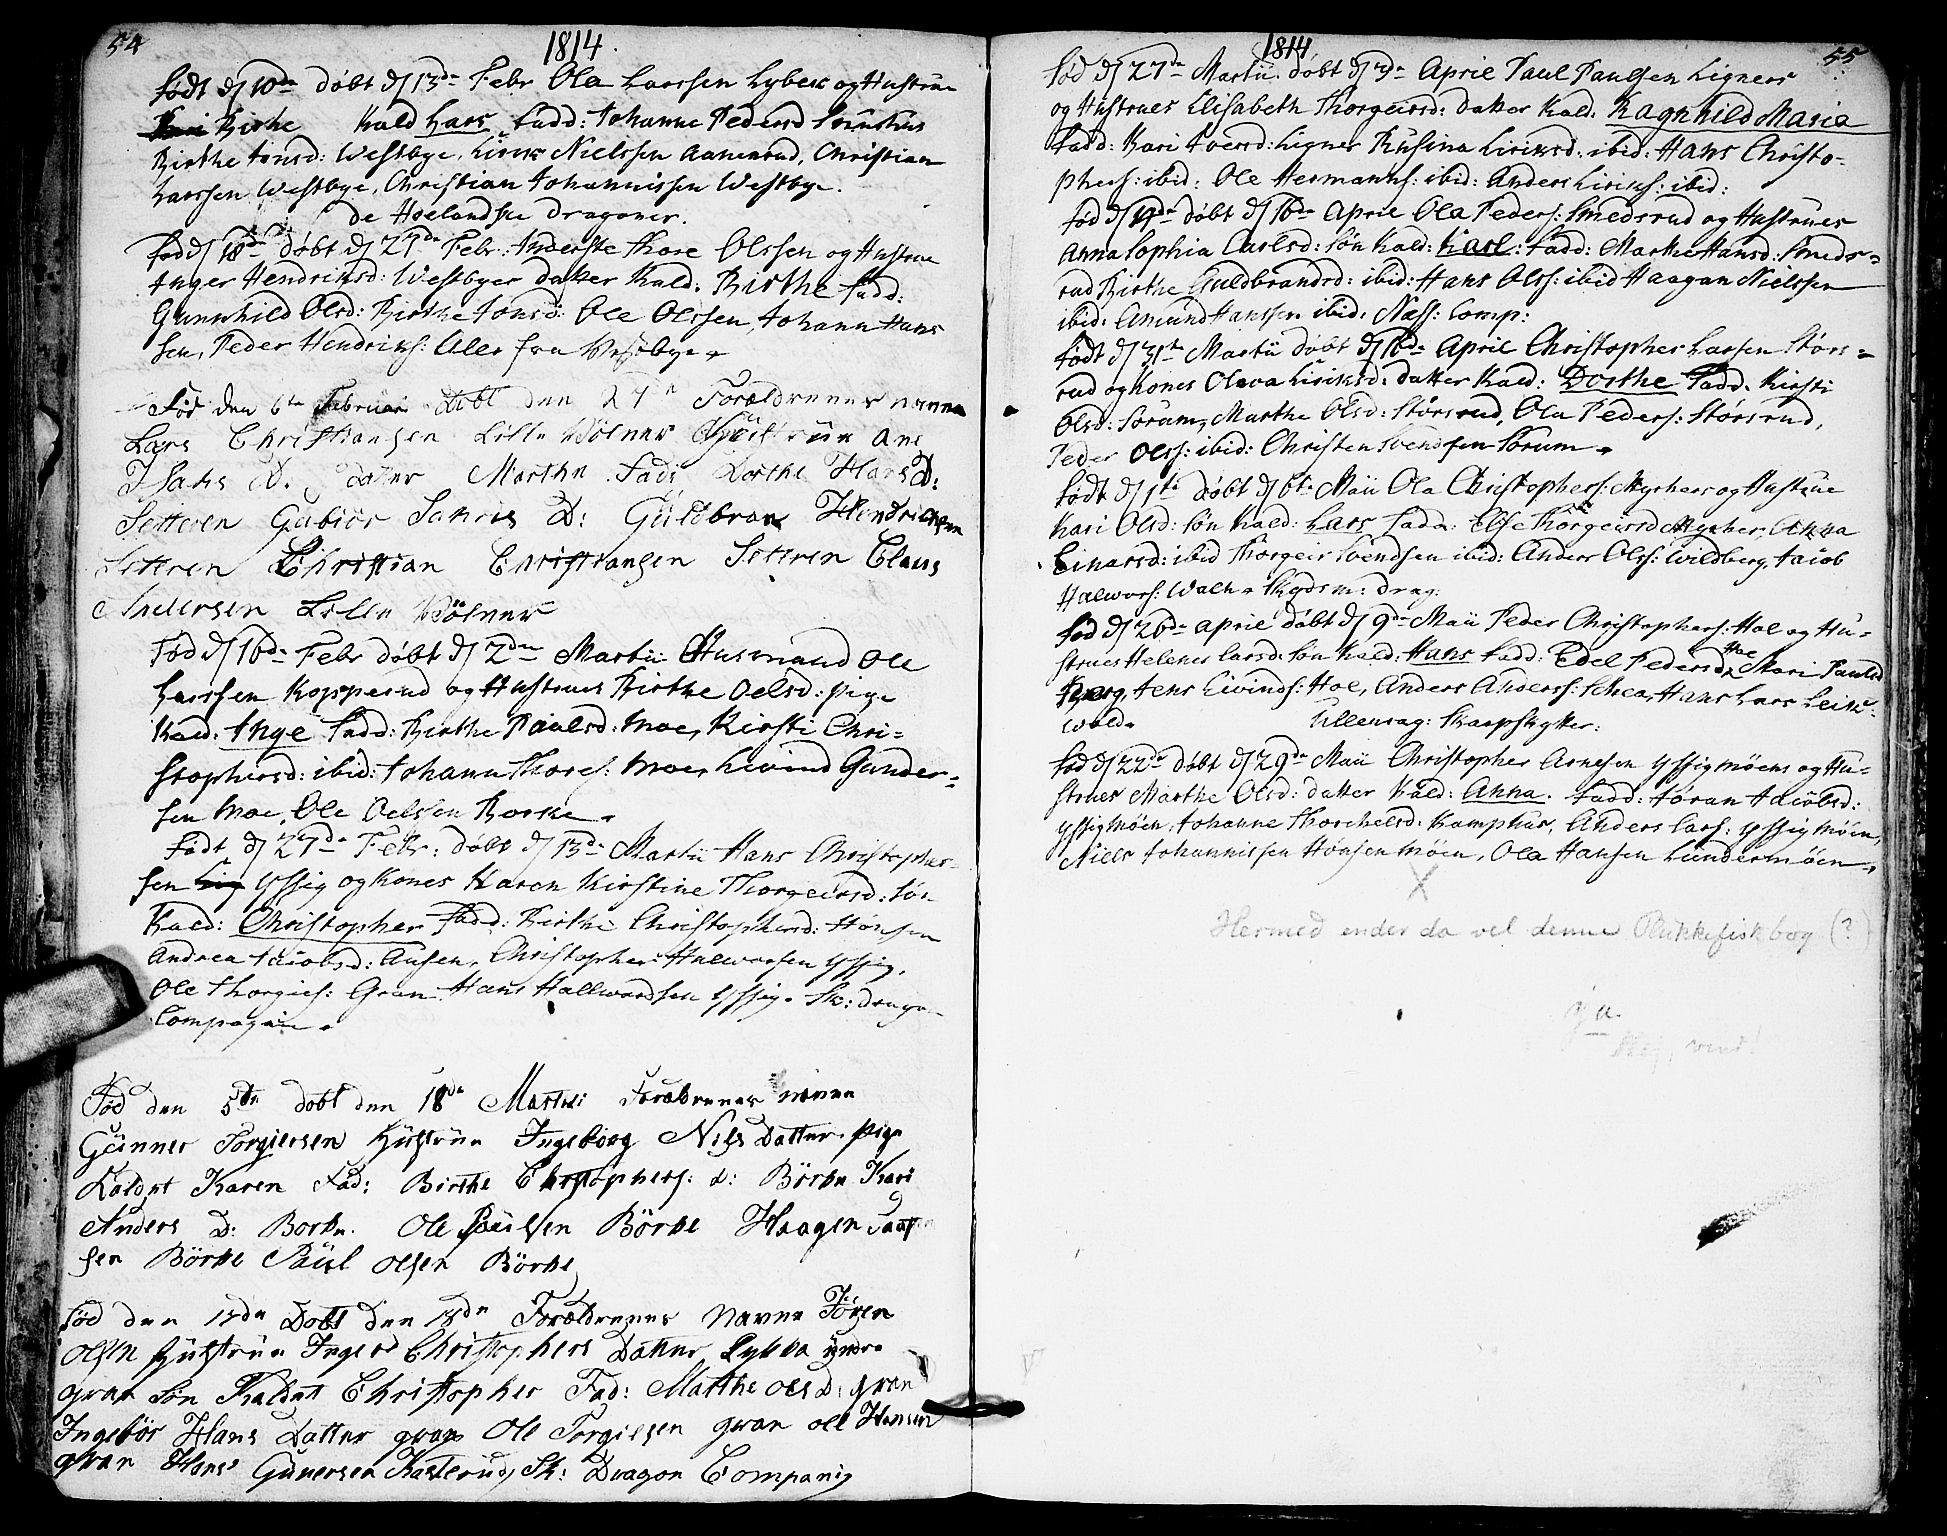 SAO, Sørum prestekontor Kirkebøker, F/Fa/L0002: Ministerialbok nr. I 2, 1759-1814, s. 54-55